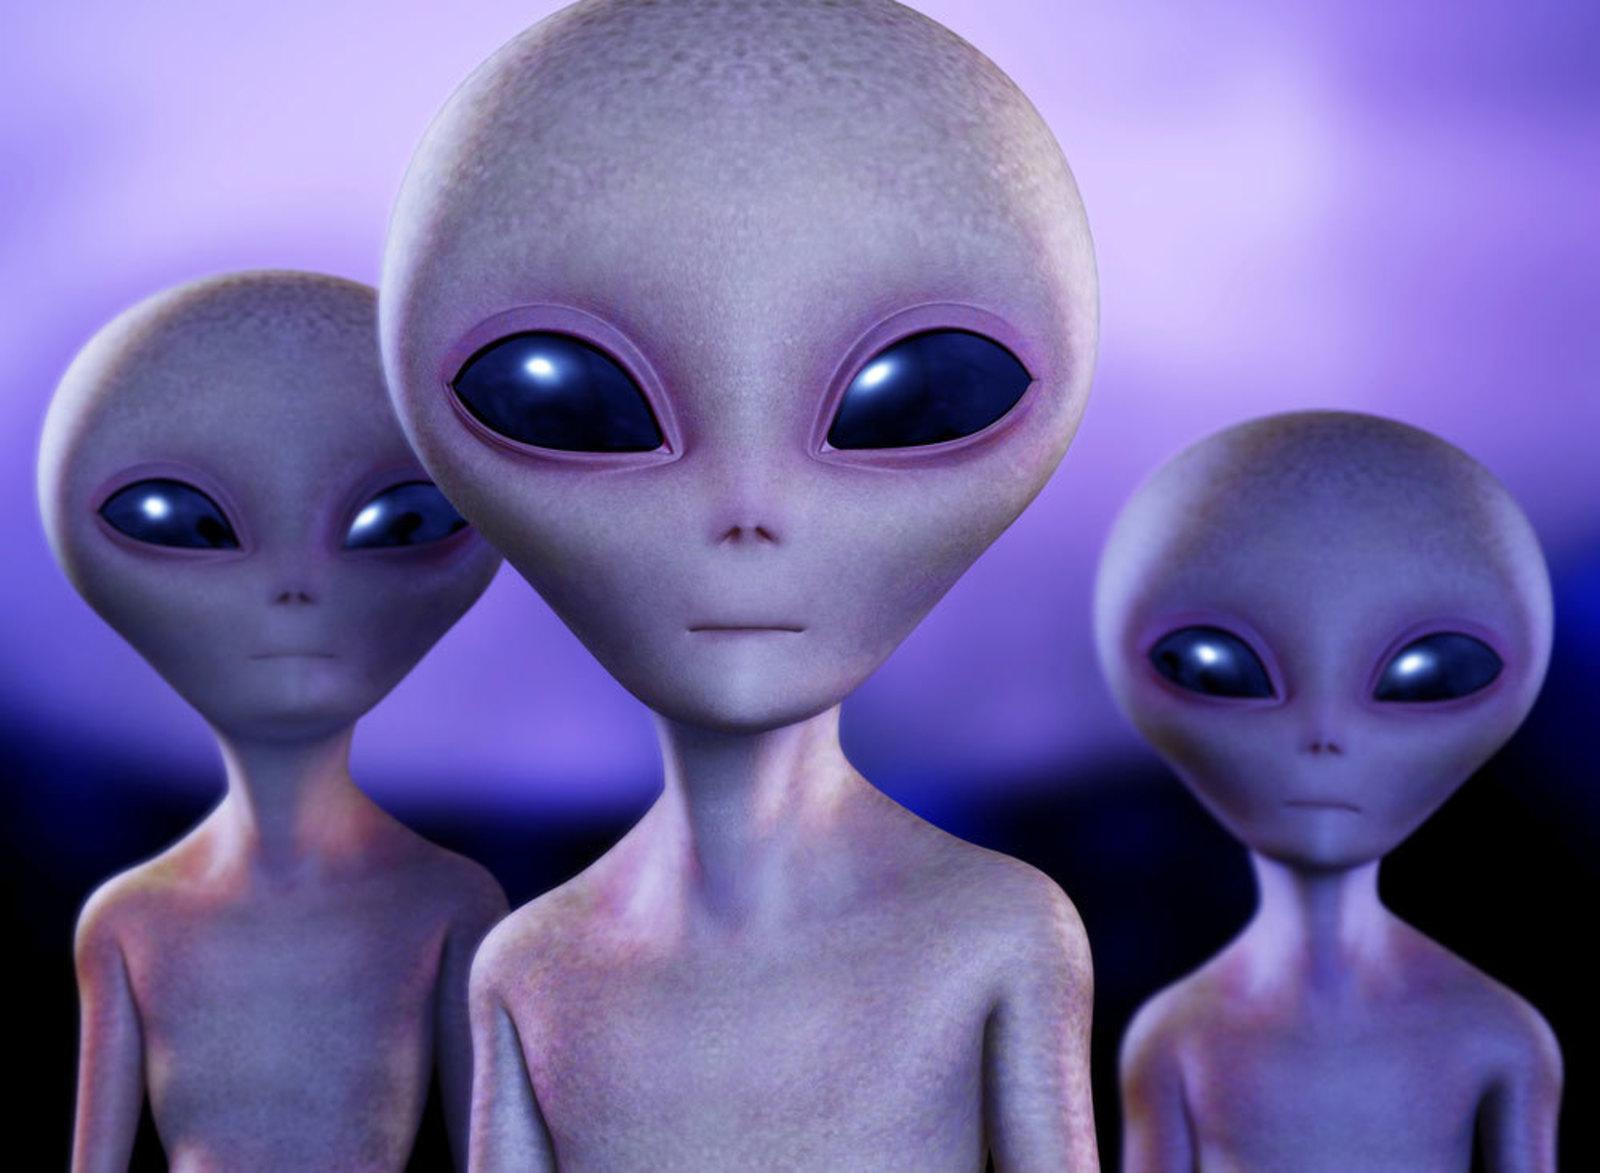 Aliens ftw